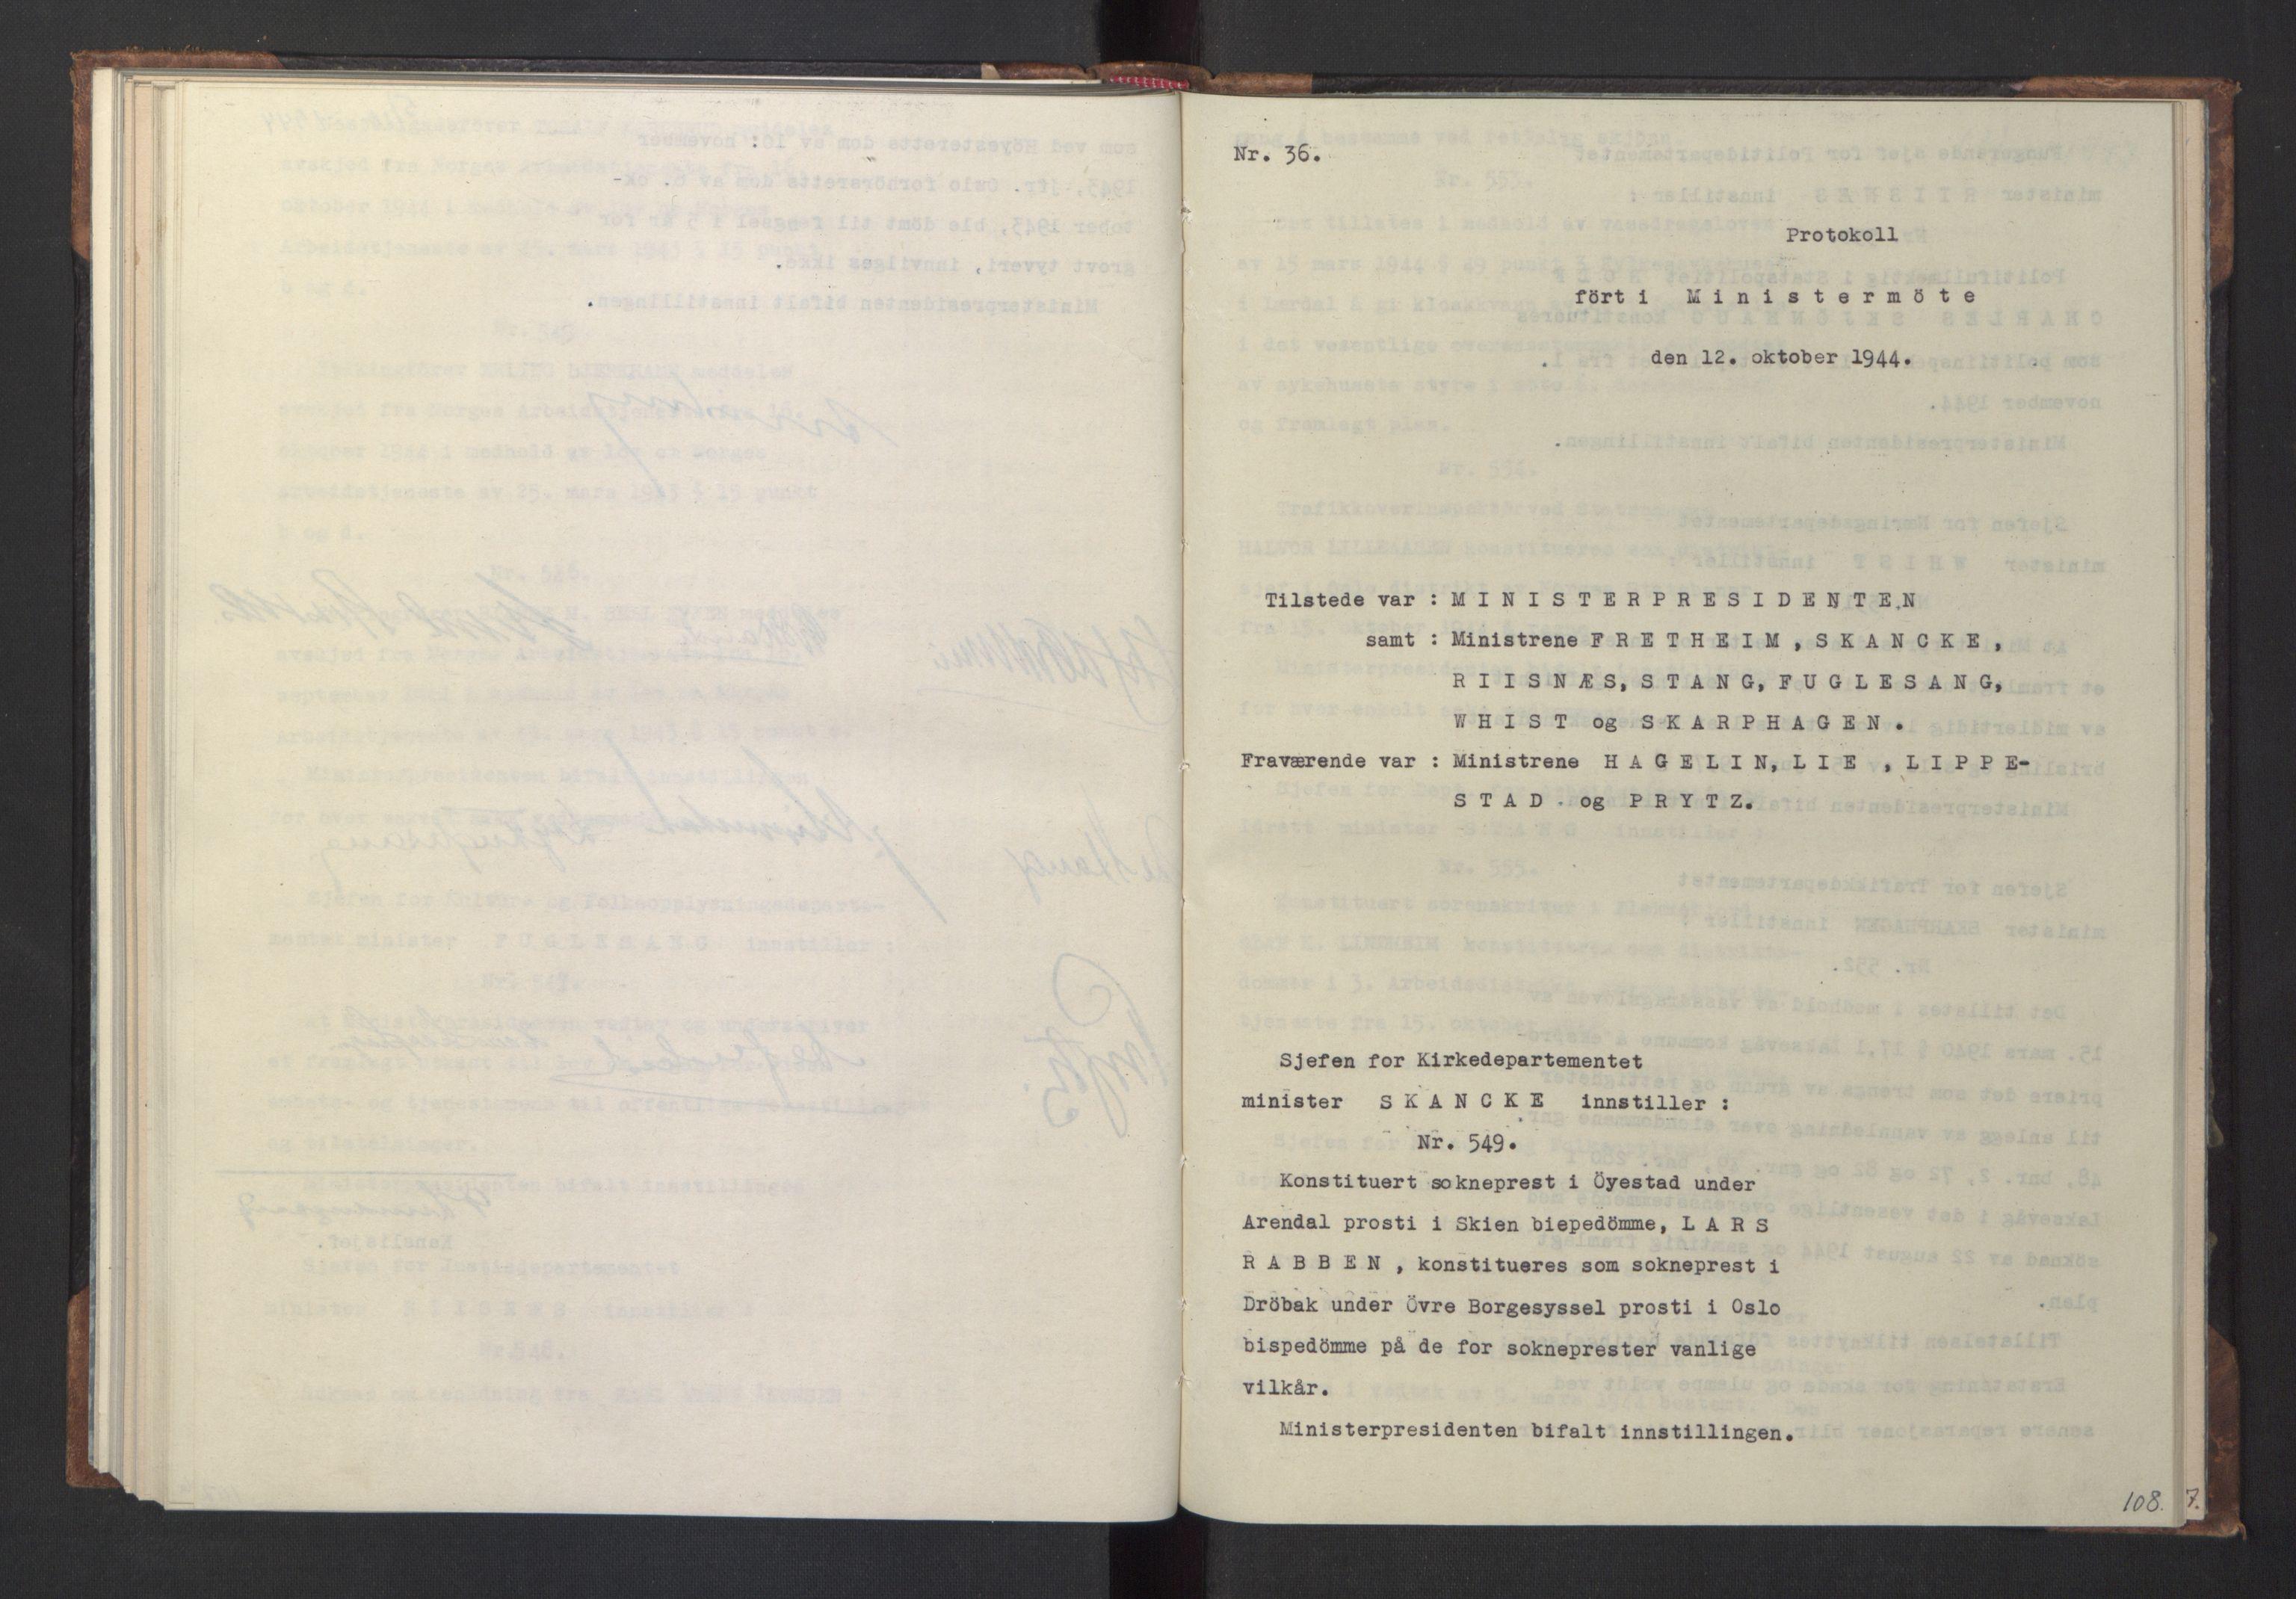 RA, NS-administrasjonen 1940-1945 (Statsrådsekretariatet, de kommisariske statsråder mm), D/Da/L0005: Protokoll fra ministermøter, 1944, s. 107b-108a